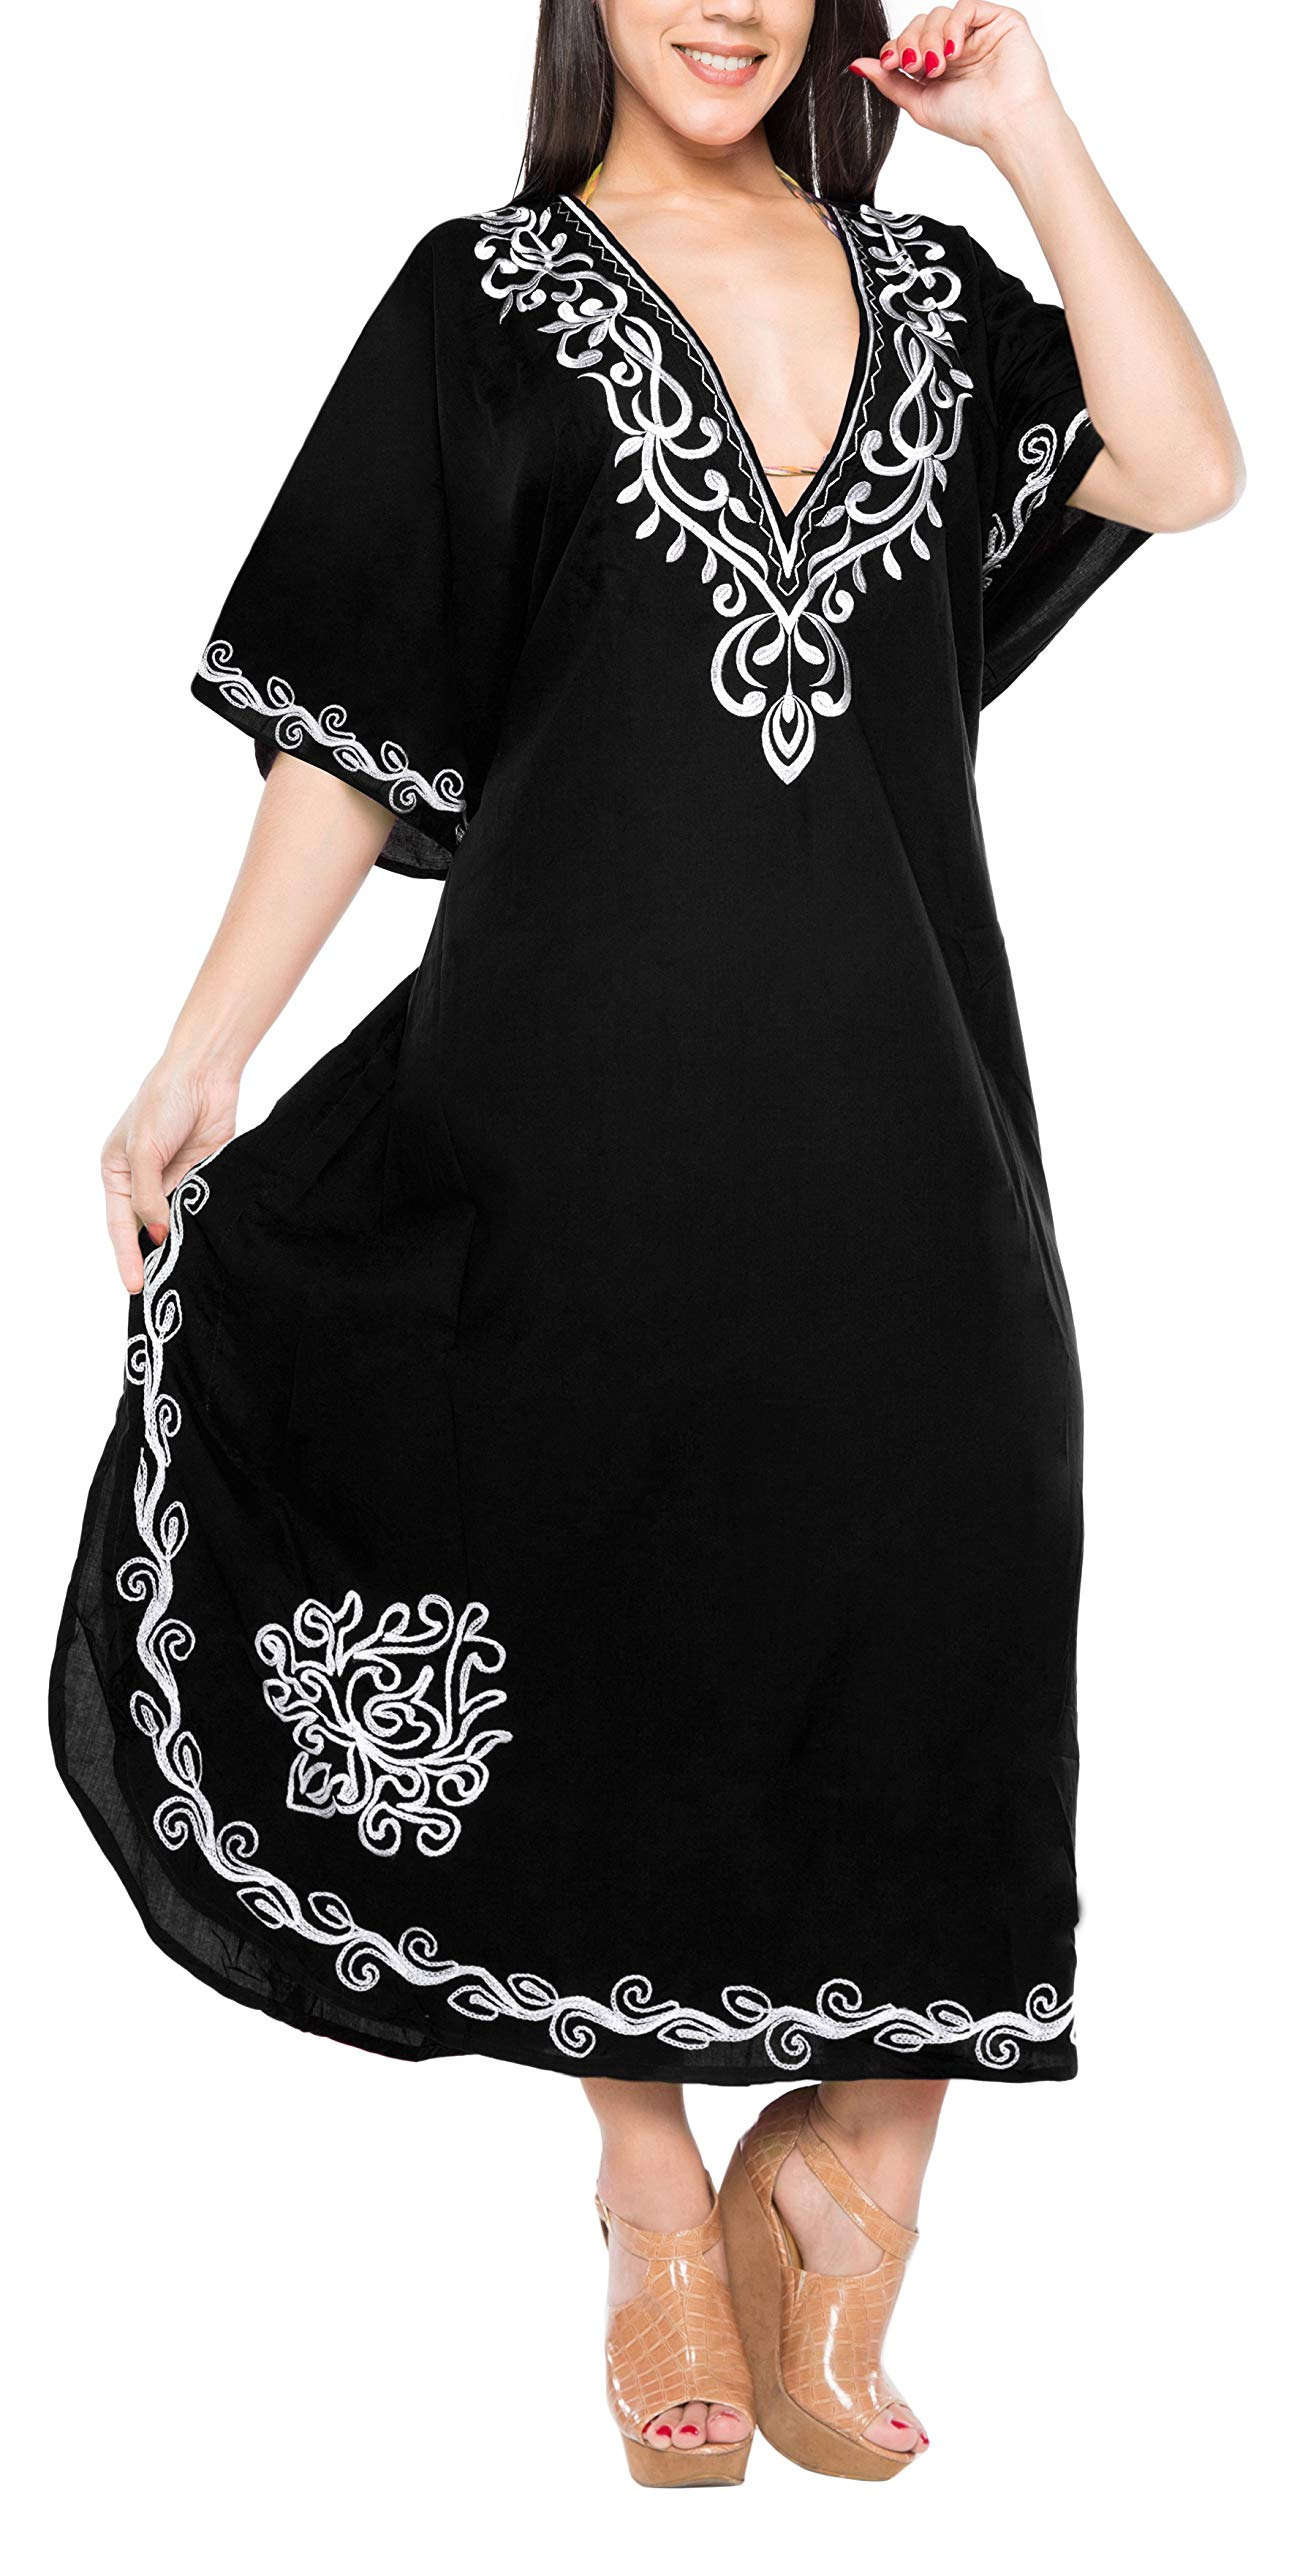 LA LEELA PV Solid Long Caftan Casual Dress Girls Black_923 OSFM 14-32W [L-5X]